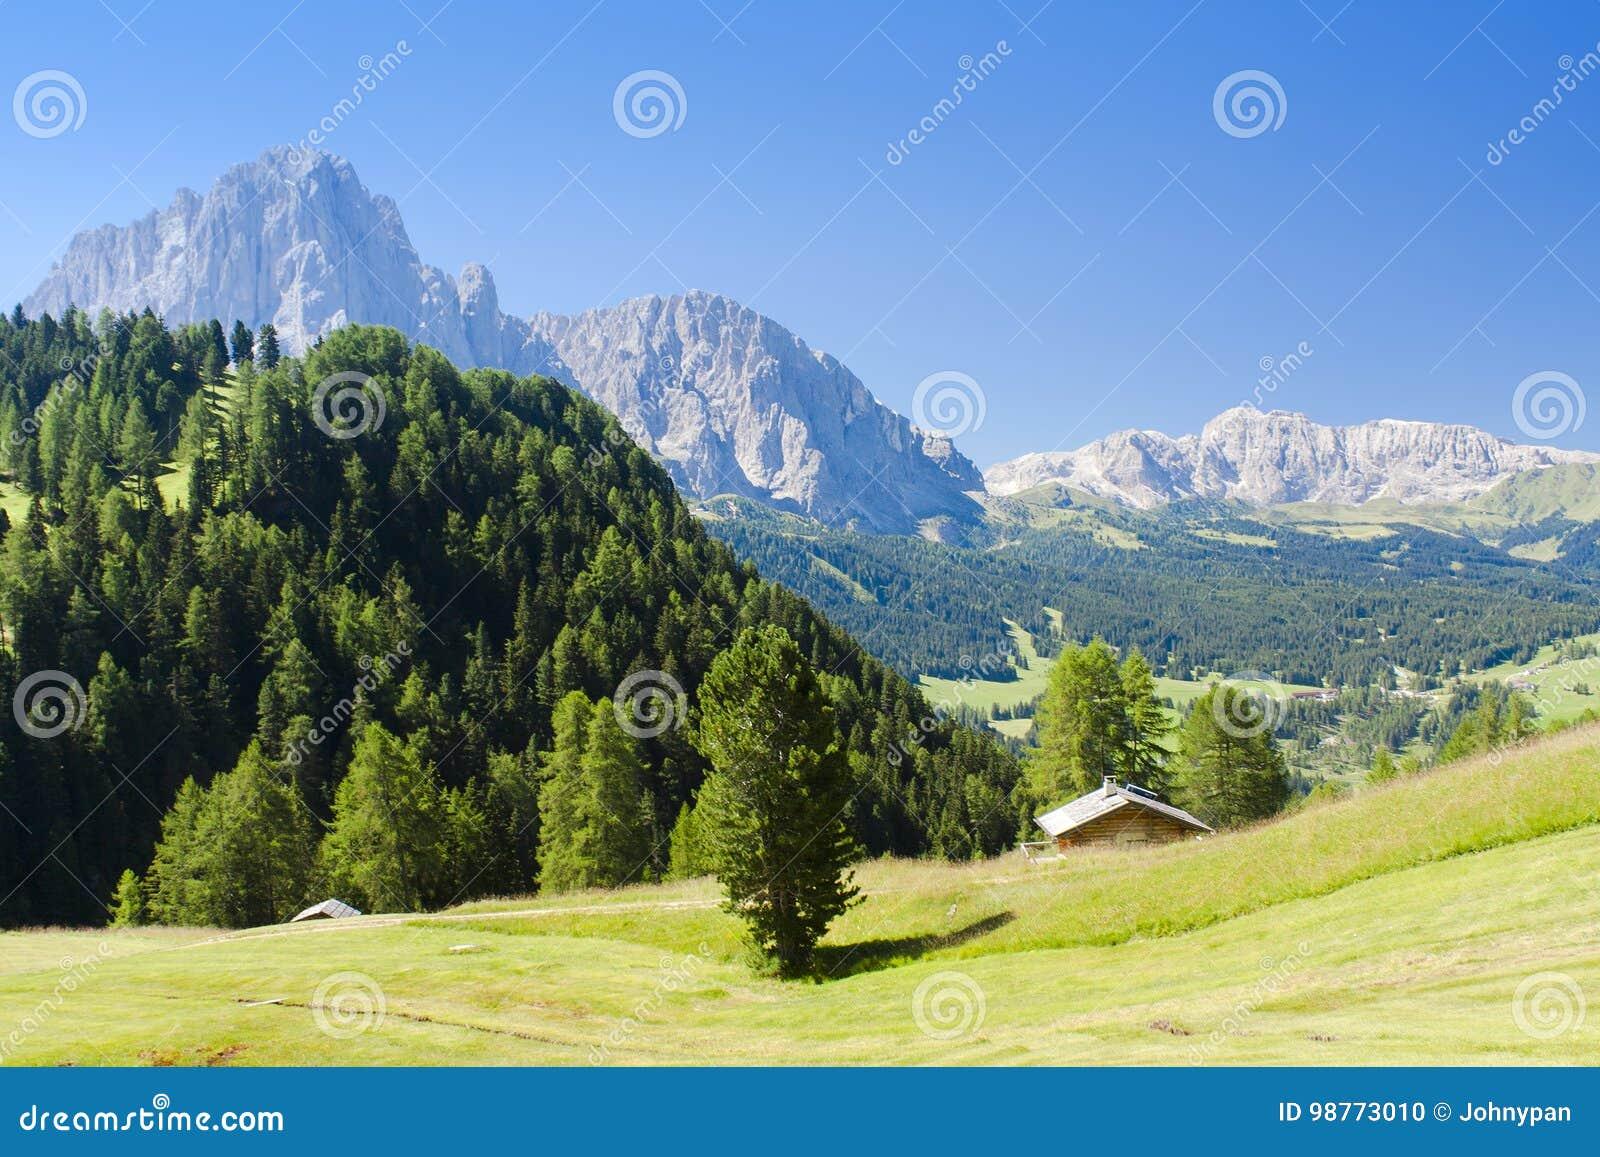 Alpine mountain landscape in Italy Dolomites